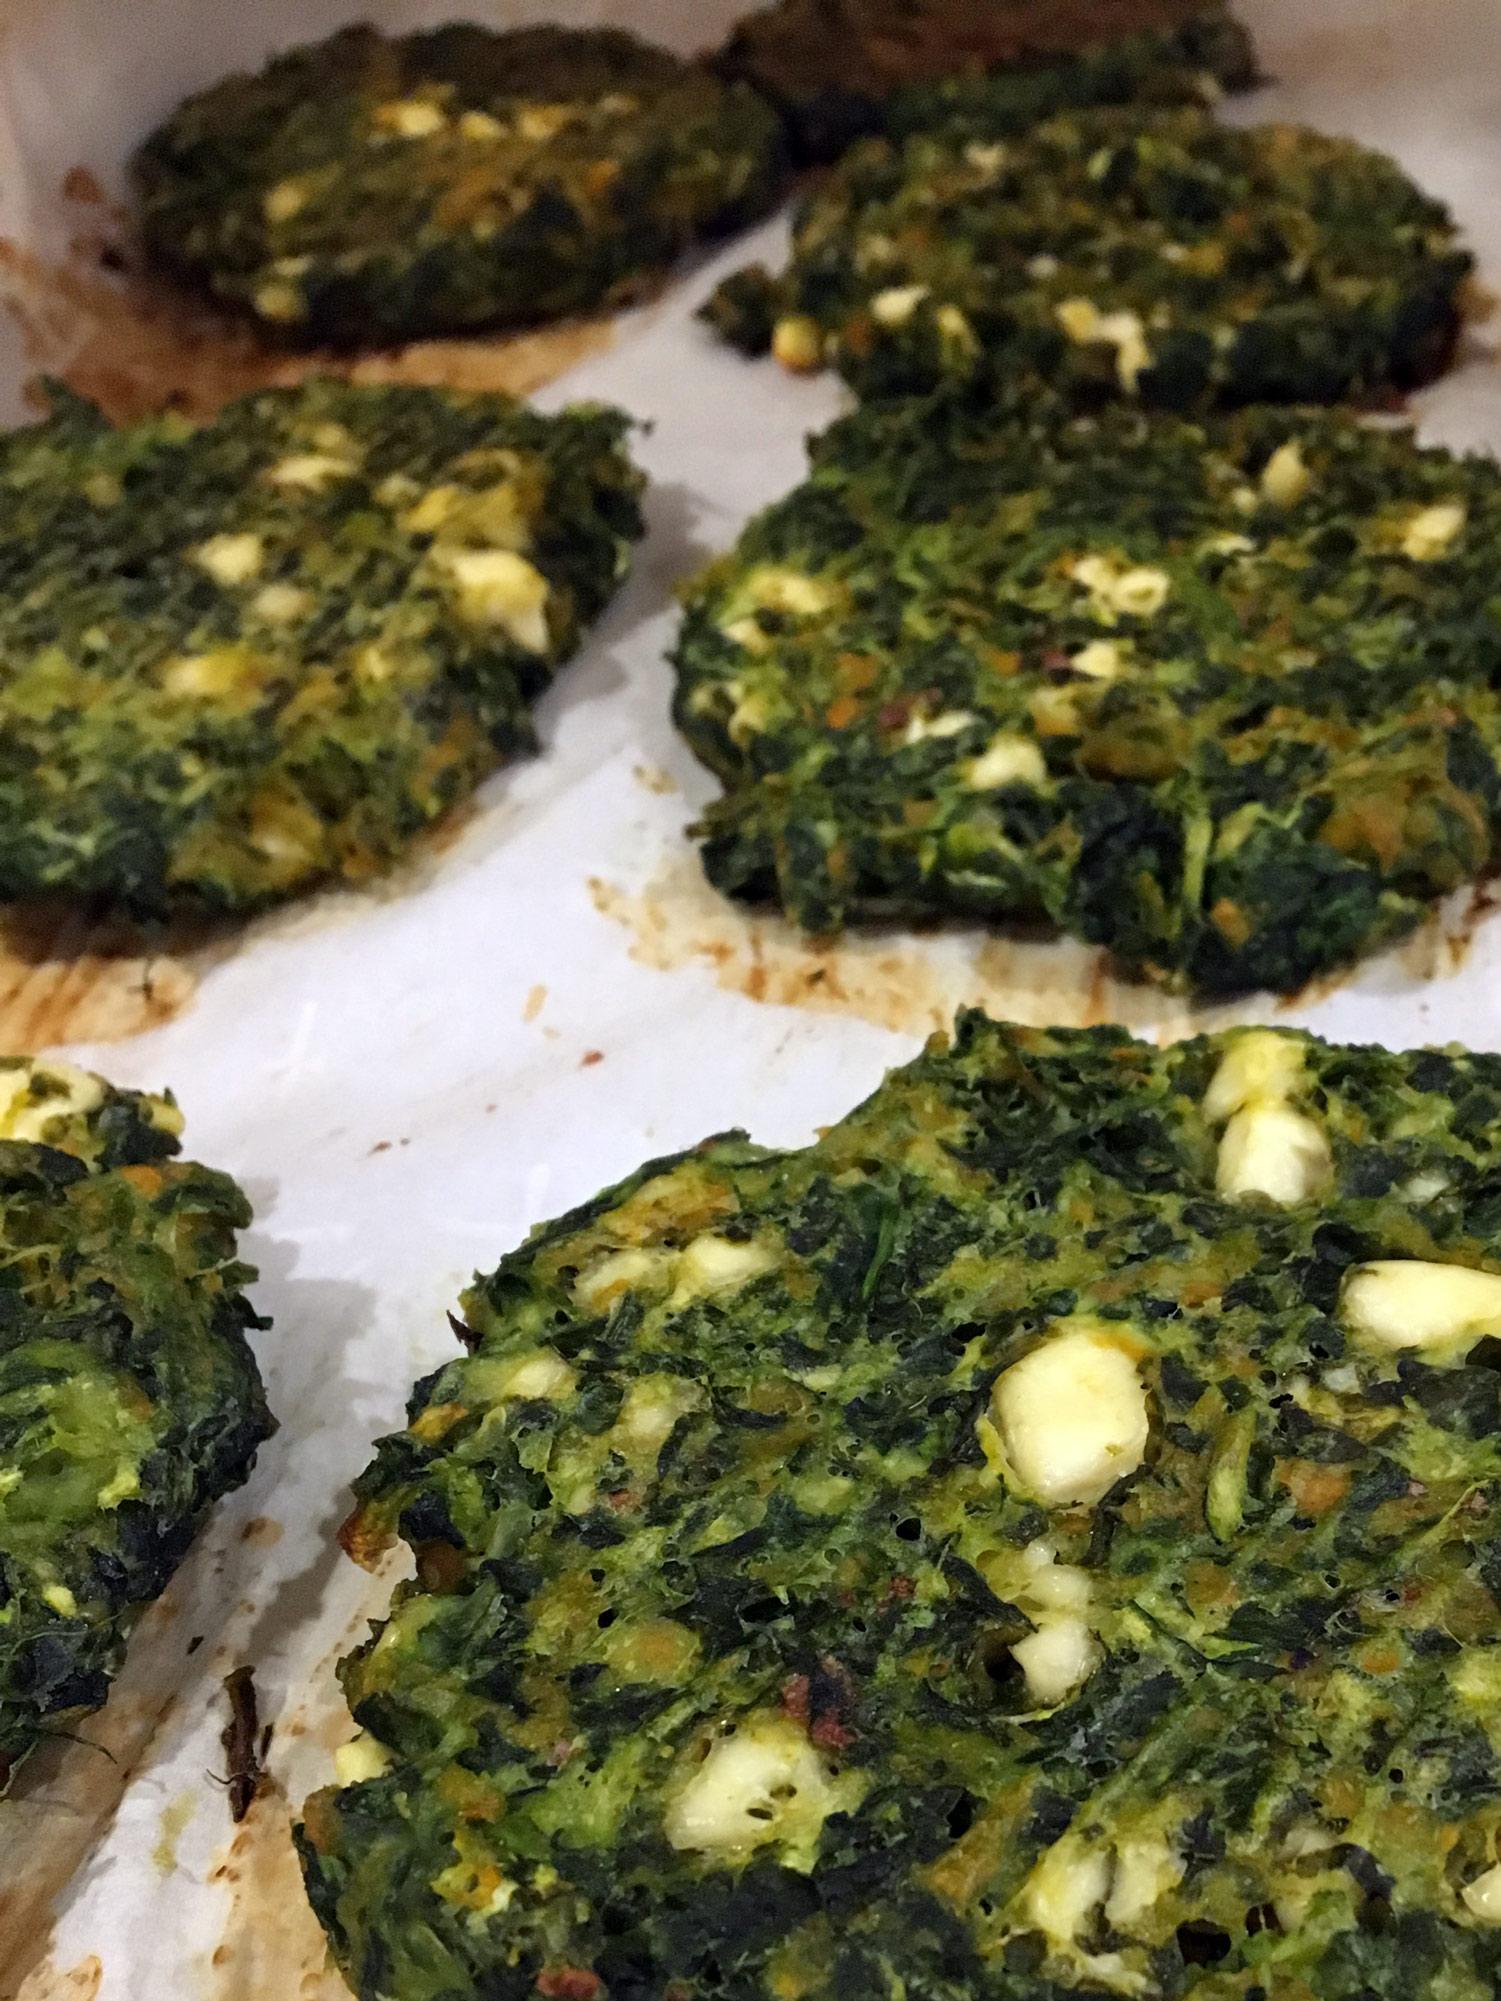 Baked Zucchini Sweet Potato Greens Pancakes With Garlic Tzatziki Emi Ponce De Souza